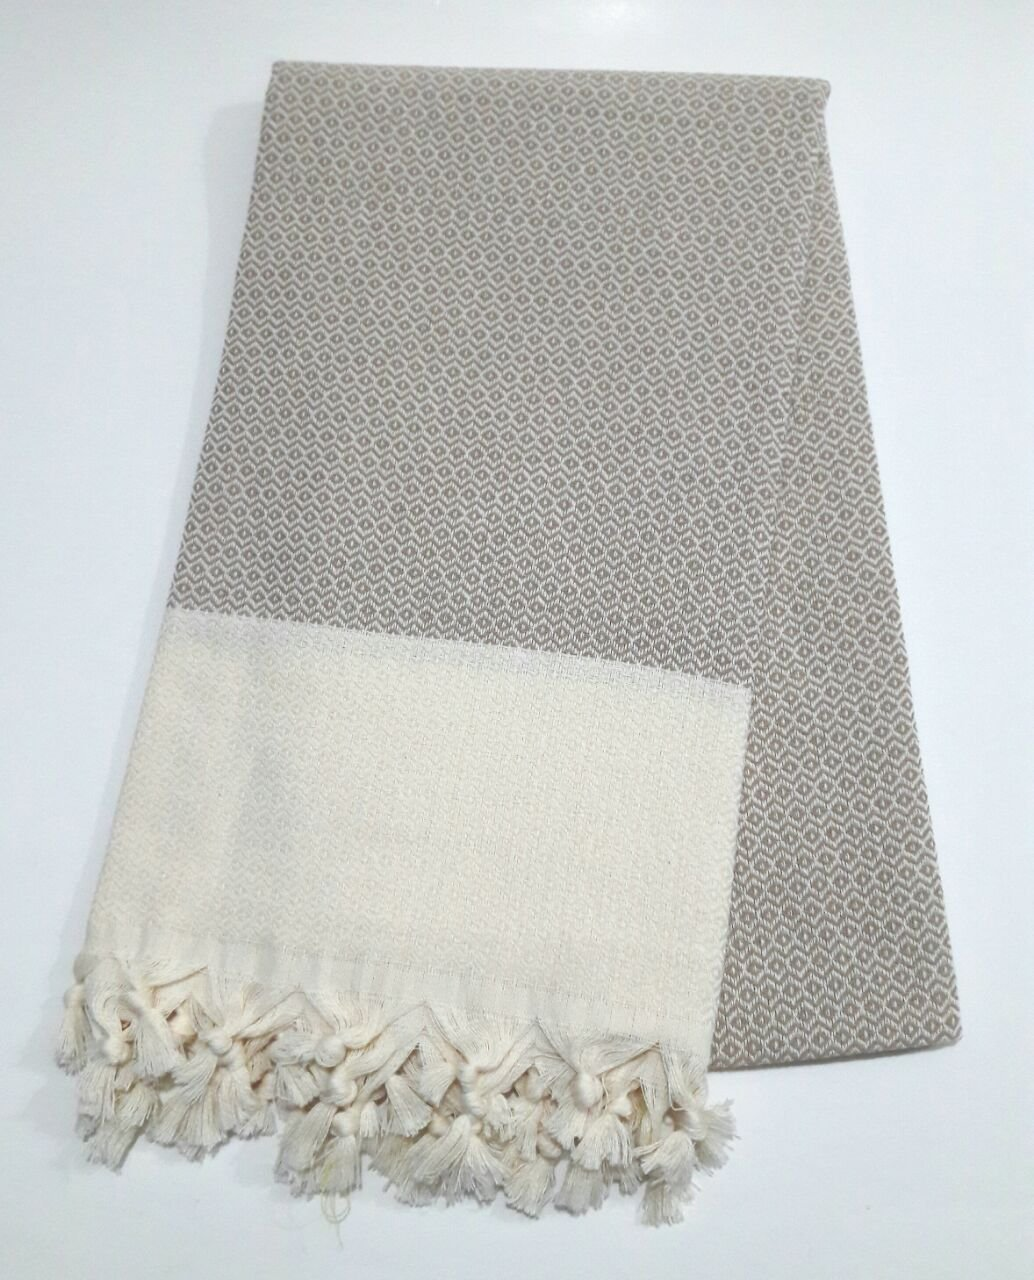 "Paramus 100% Turkish Cotton Turkish Peshtemal Hamam Towel Wrap Pareo Fouta (37x 70) (Sand, 1) - 100% COTTON Made in Turkey 95x175 cm (""37x70"" inches) - bathroom-linens, bathroom, bath-towels - 71NJNg7GMiL -"